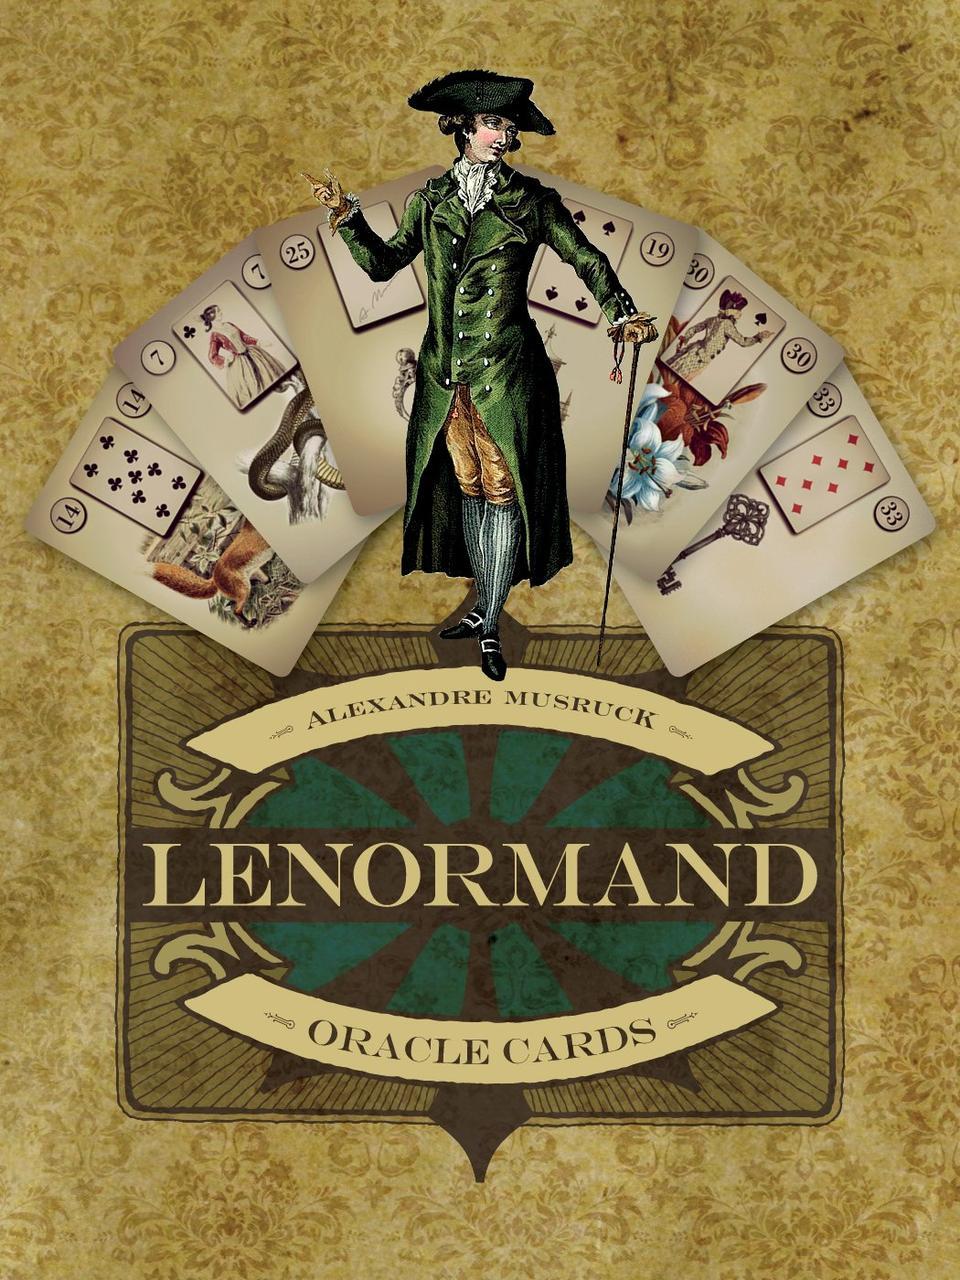 Lenormand Oracle Cards/ Ленорман (от Александра Мусрук)